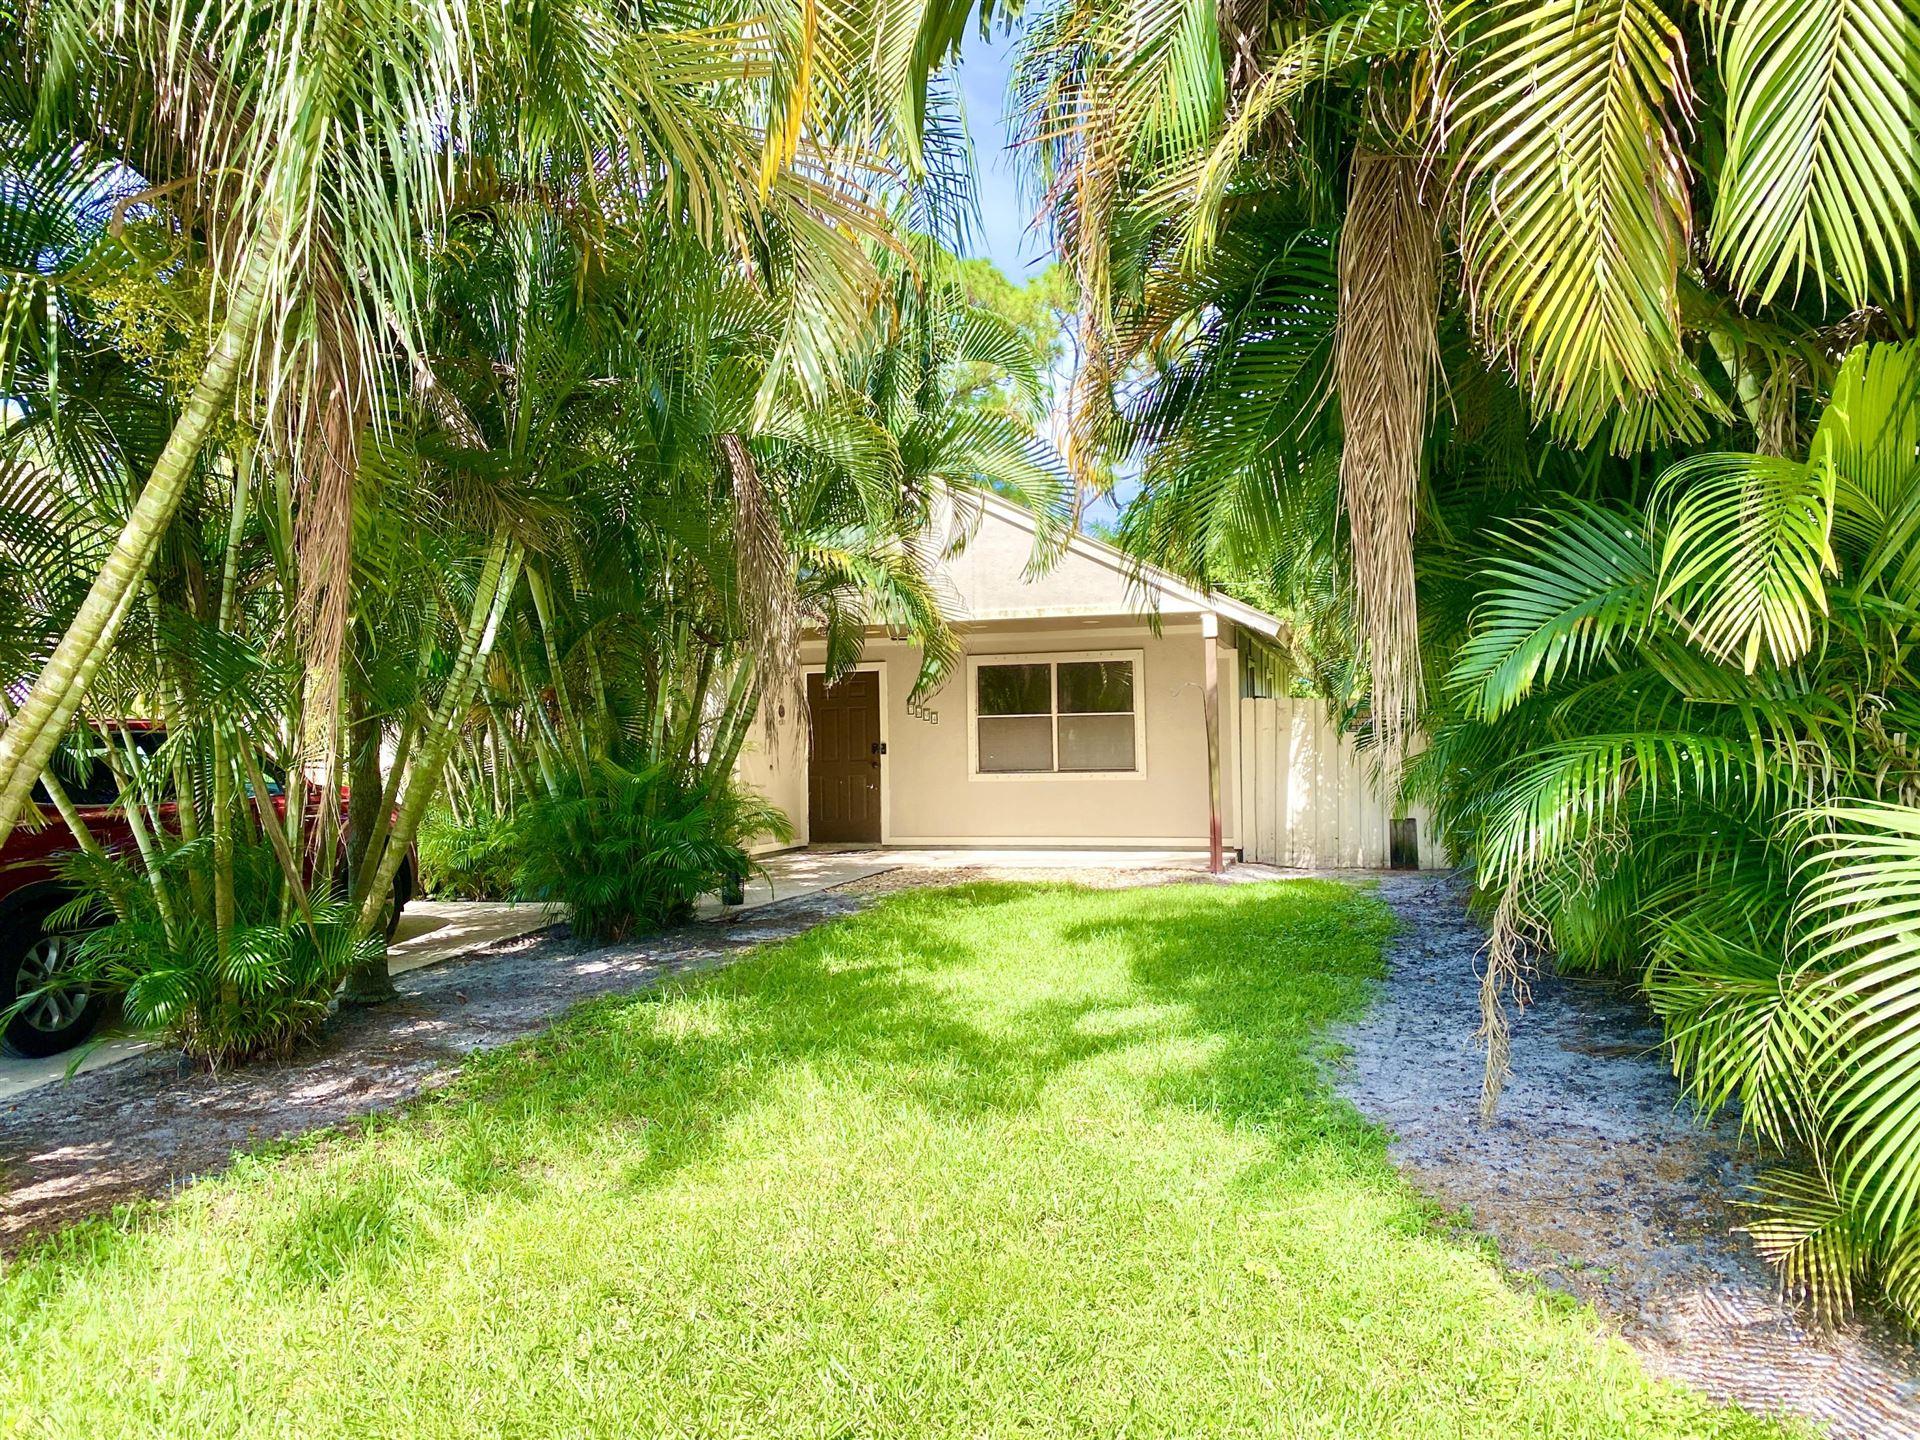 7694 4th Ter Terrace, Lake Worth, FL 33463 - #: RX-10643473